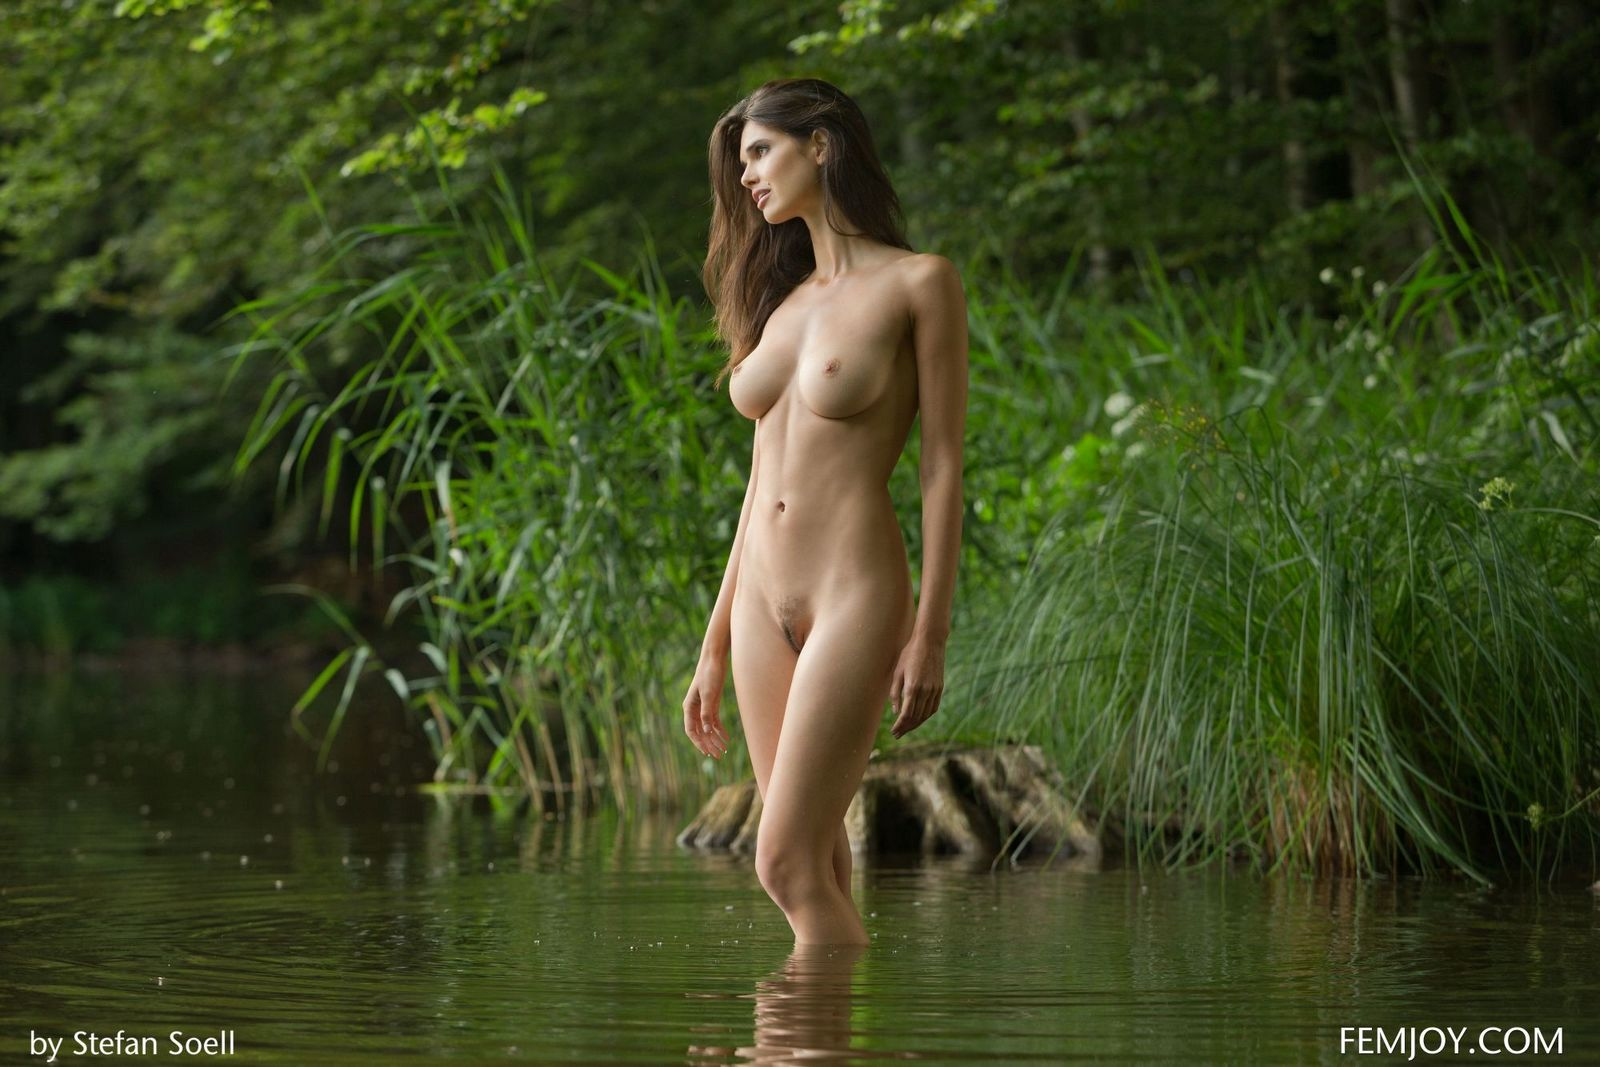 Не реально ухоженная русая порноактрисса раздетая у озера